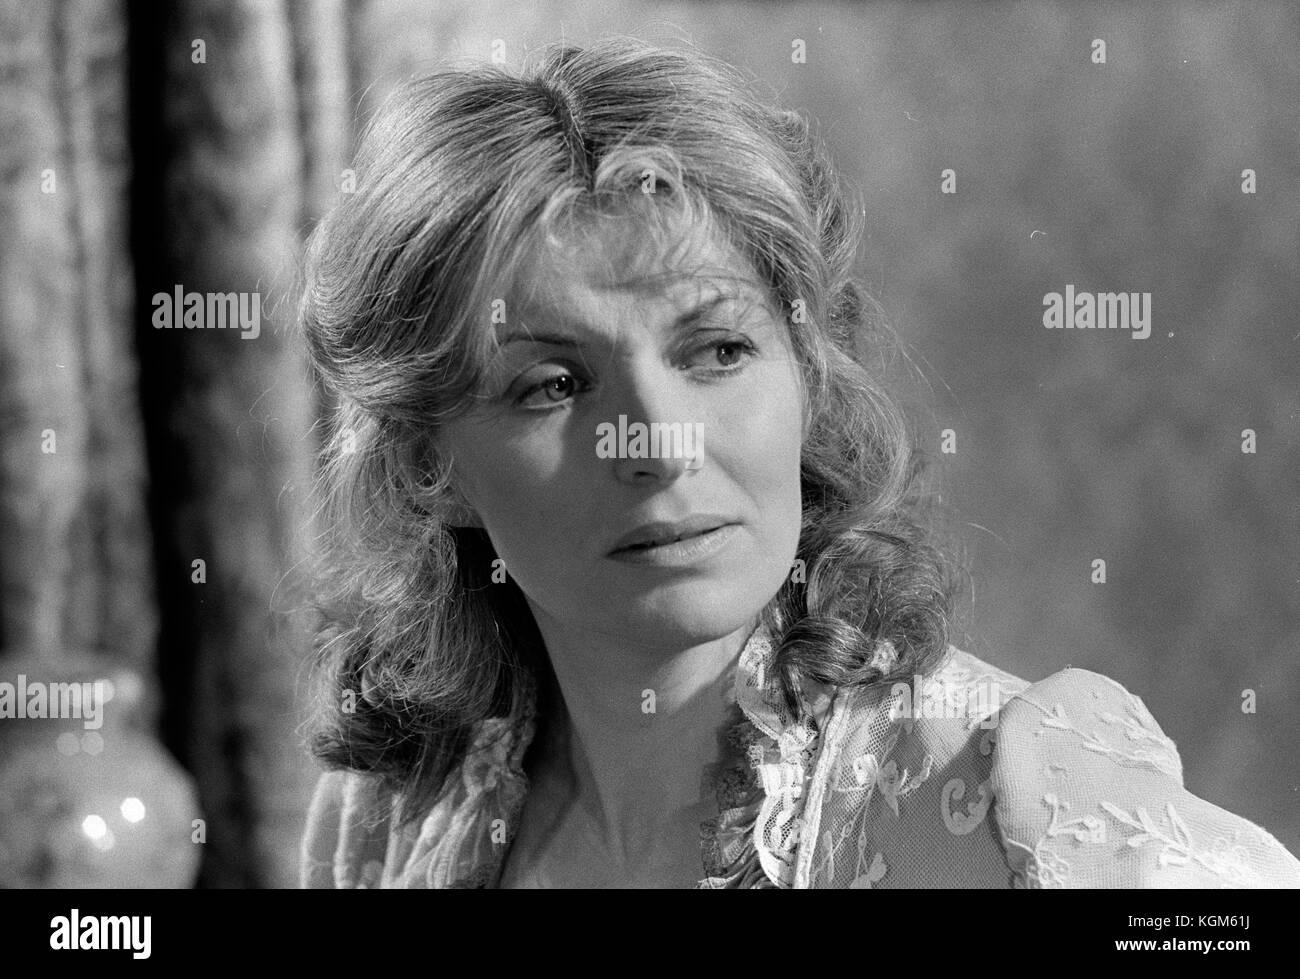 Jaya Ramsey (b. 1969) Jaya Ramsey (b. 1969) new photo